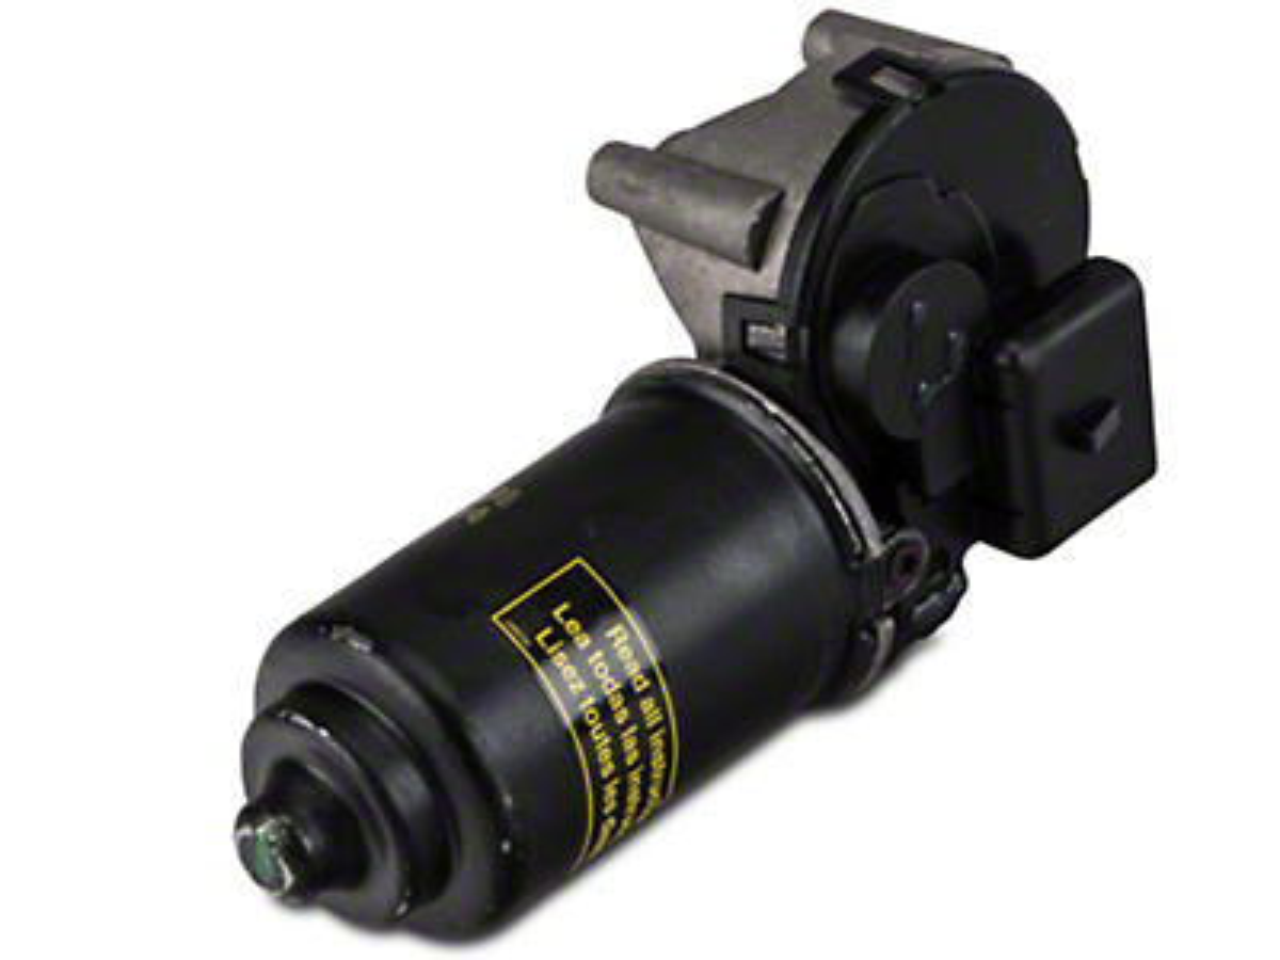 Windshield Wiper Motor (94-98 All)